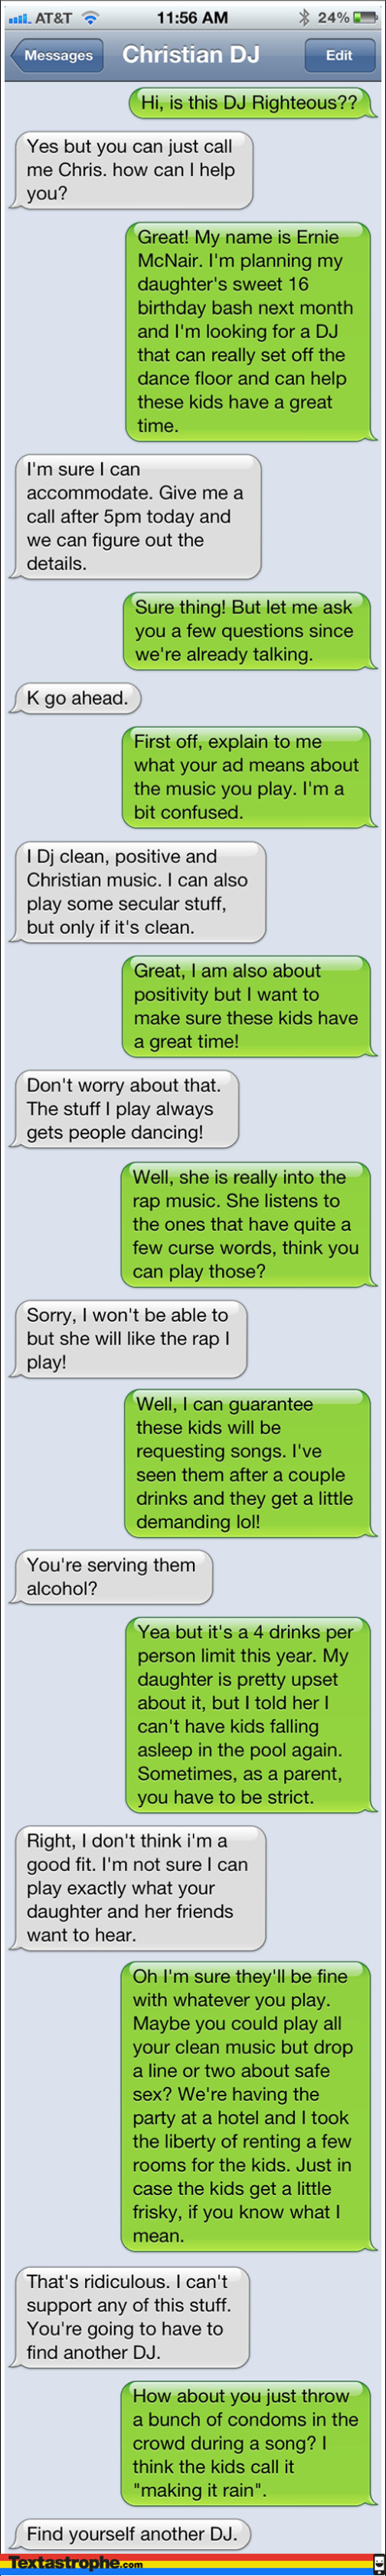 Prank Texts